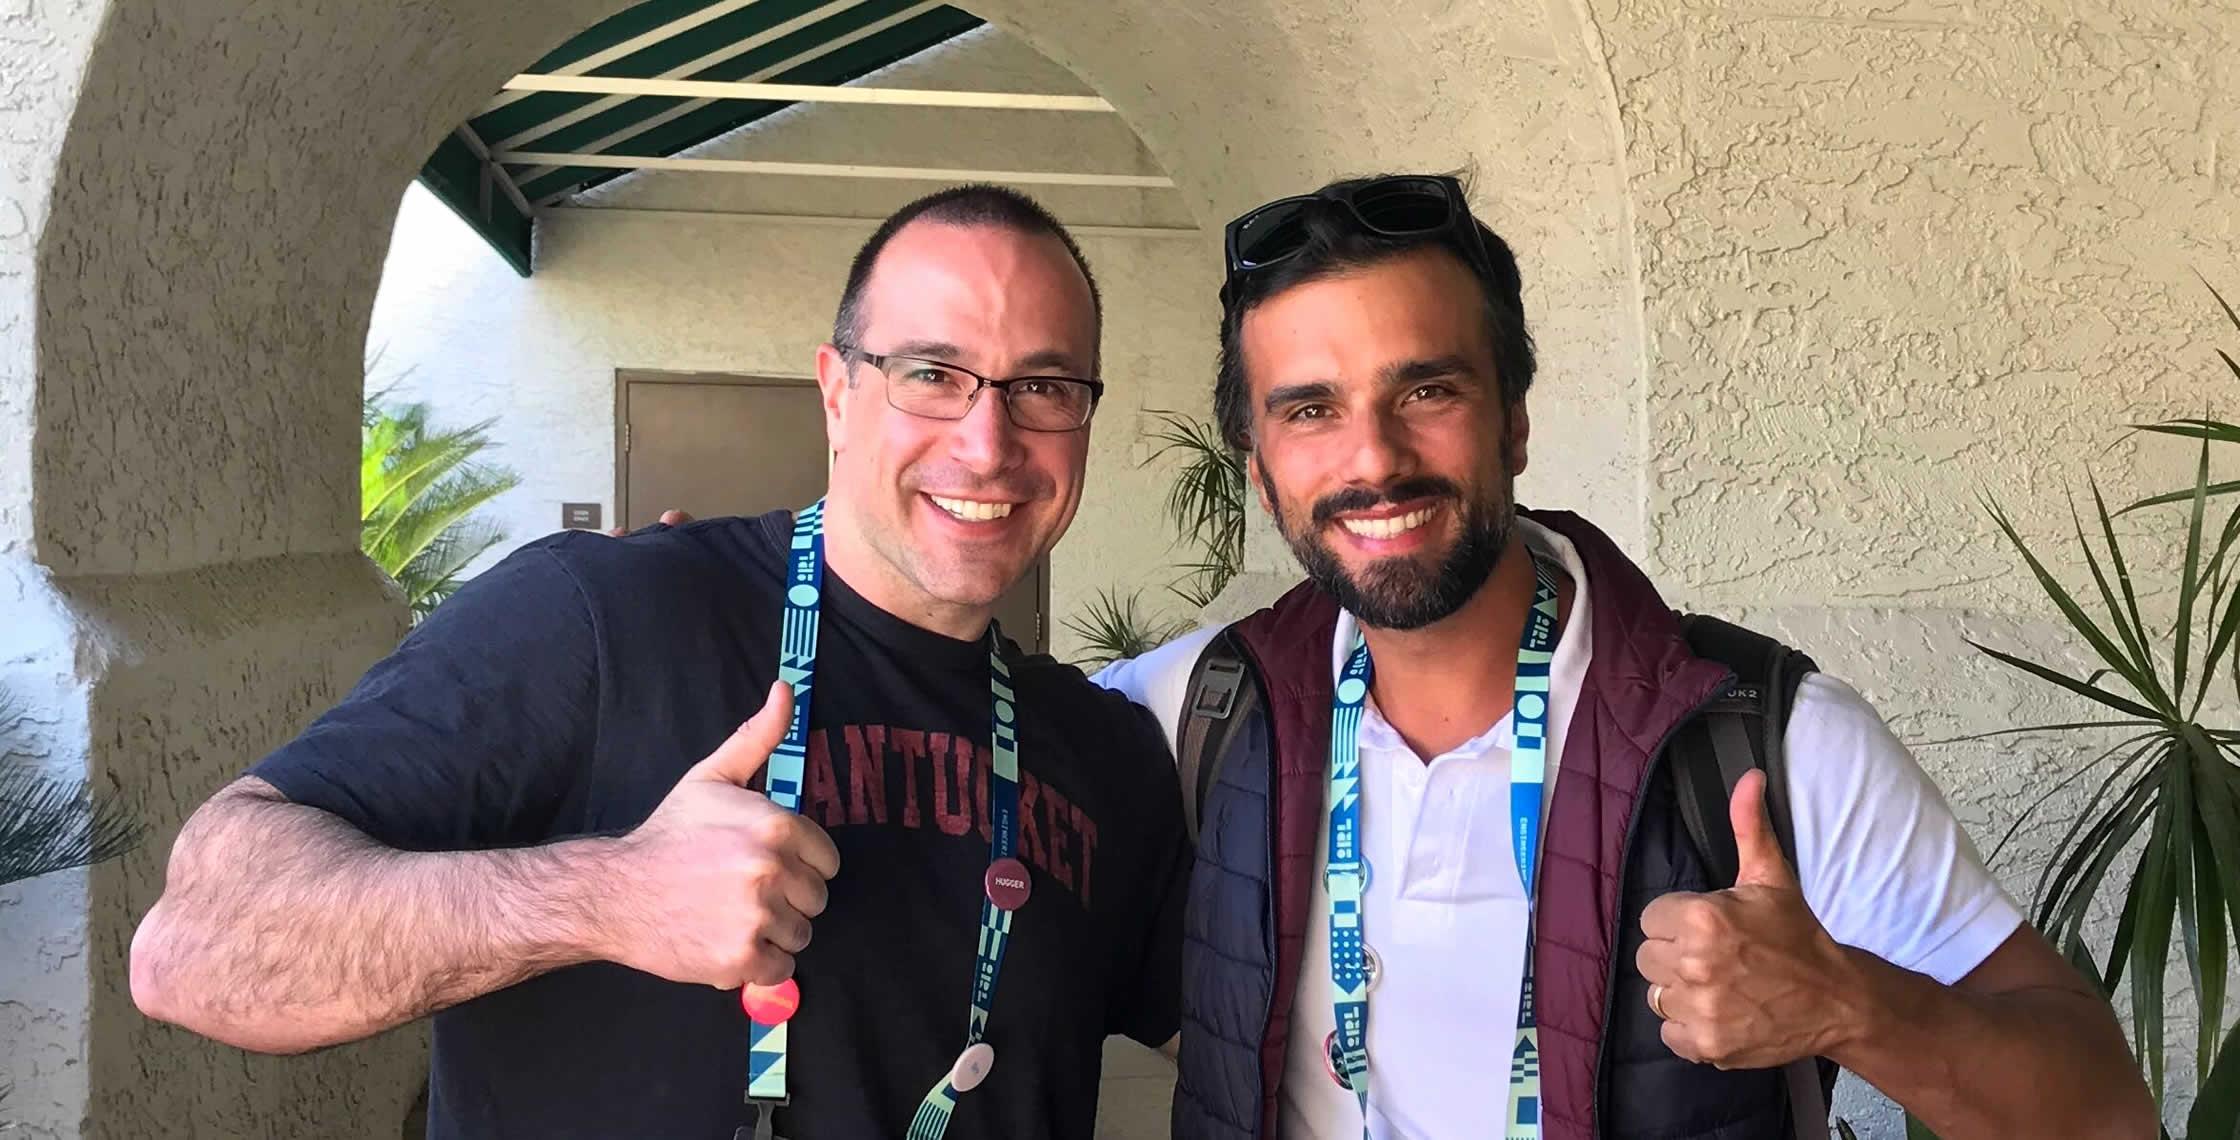 Ben Nadel at InVision In Real Life (IRL) 2019 (Phoenix, AZ) with: Bernardo Sana